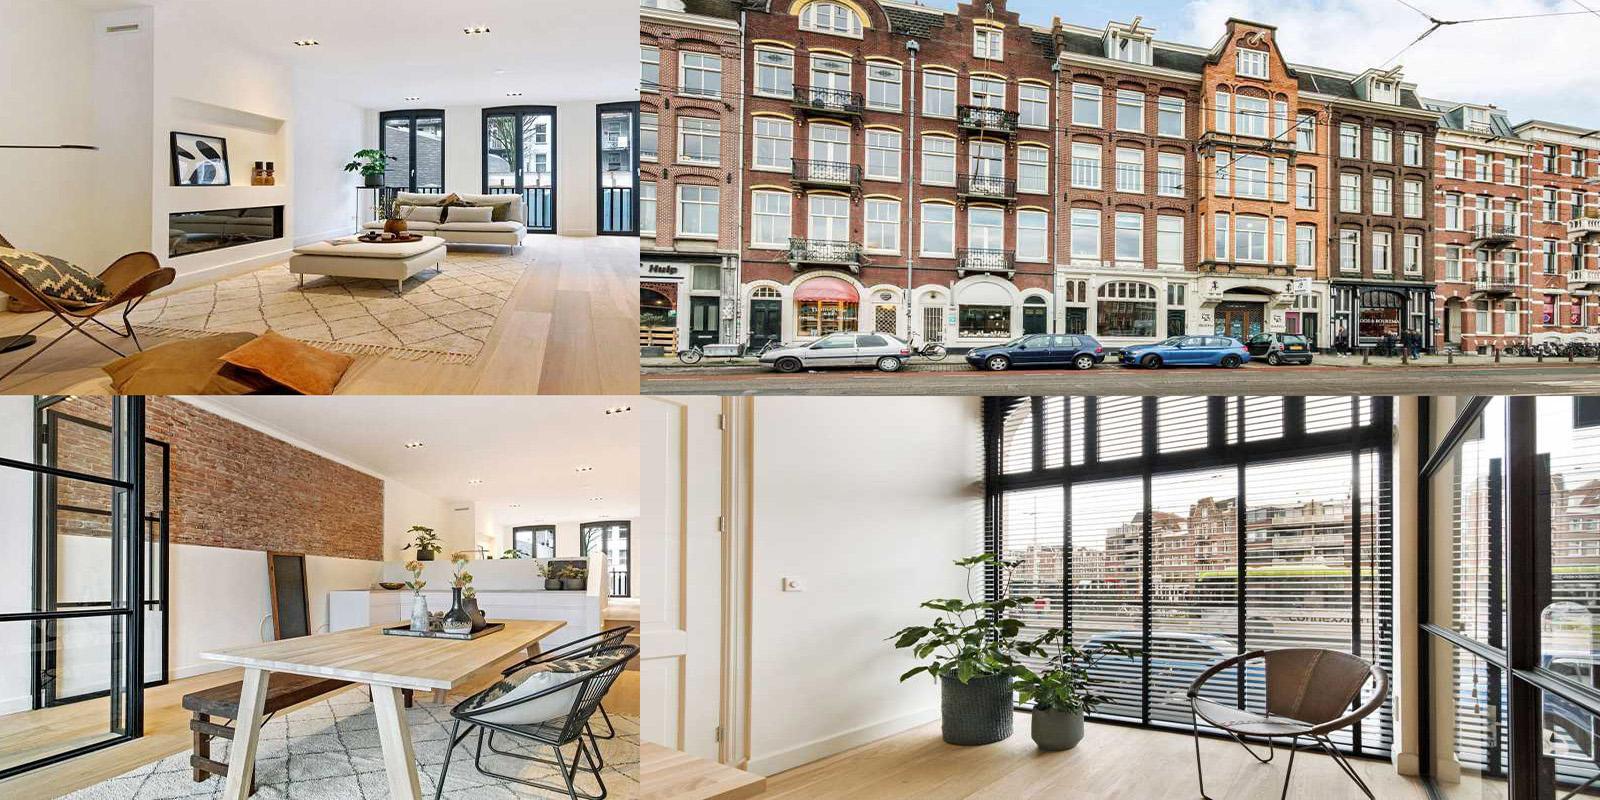 Van der Linde, Modern en Hedendaags, Architectenbureau, Verbouwing, Herenhuis, Exterieur, Tuin, architectenbureau, ontwerpbureau, the art of living